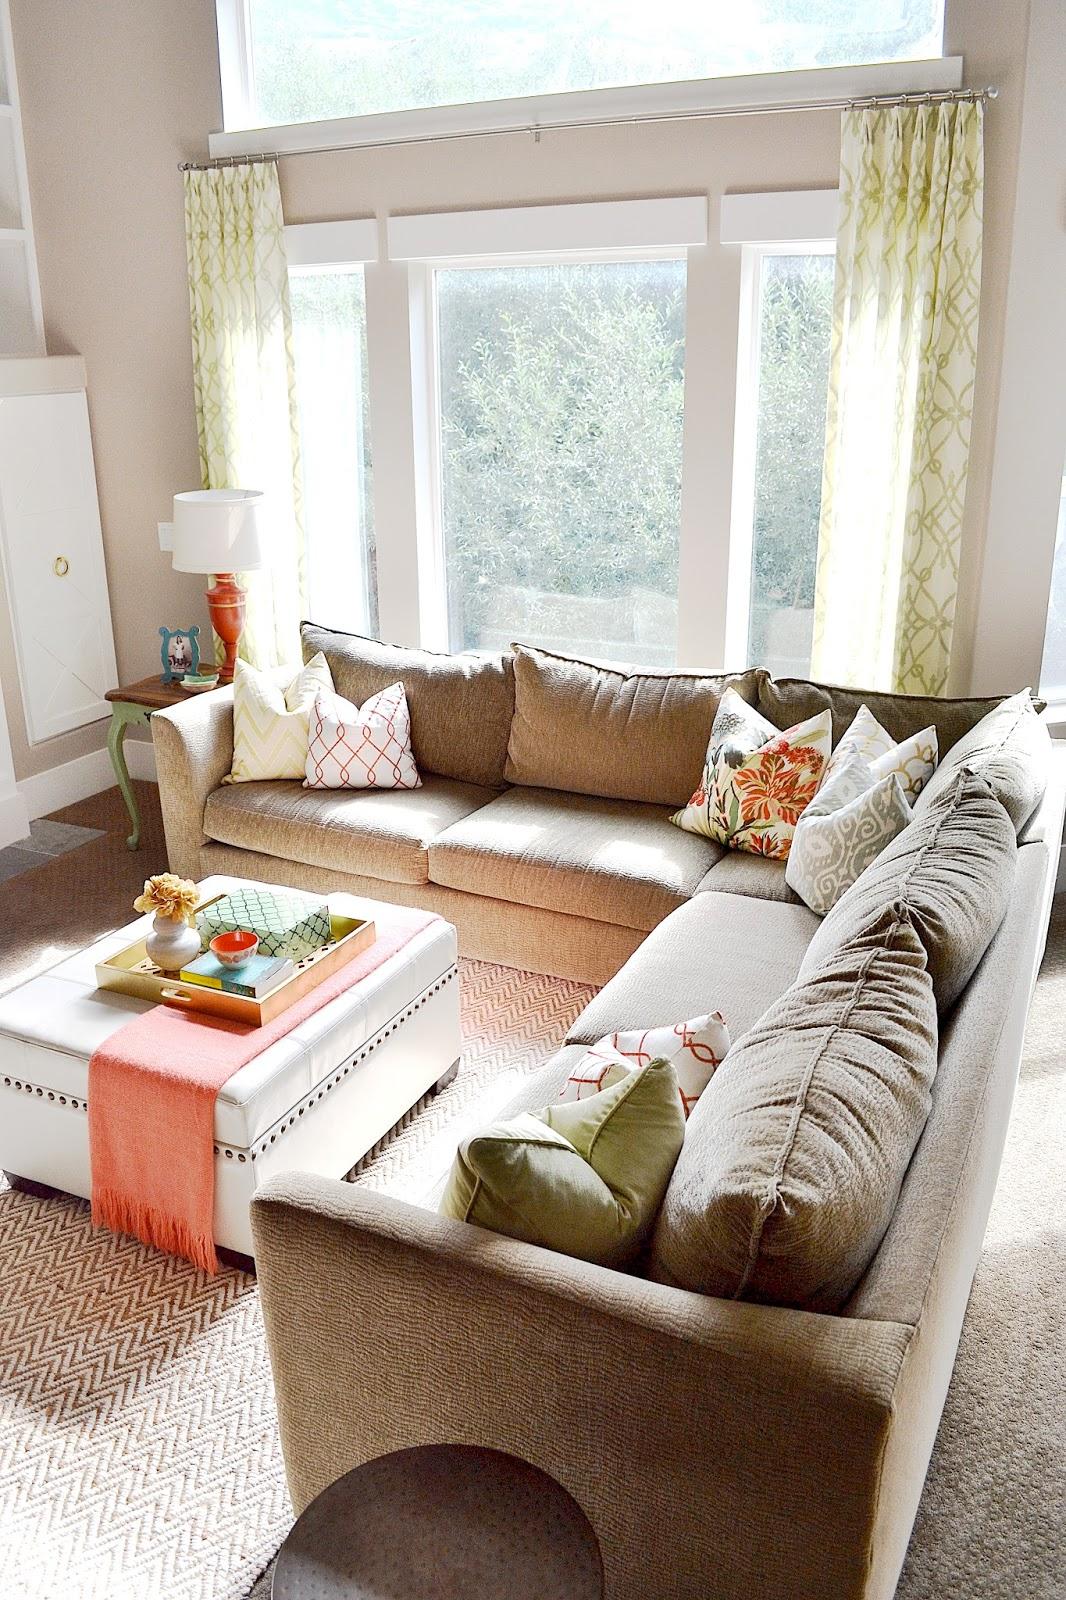 Sita Montgomery Interiors: Sita Montgomery Interiors: My New Home: Basement Family Room